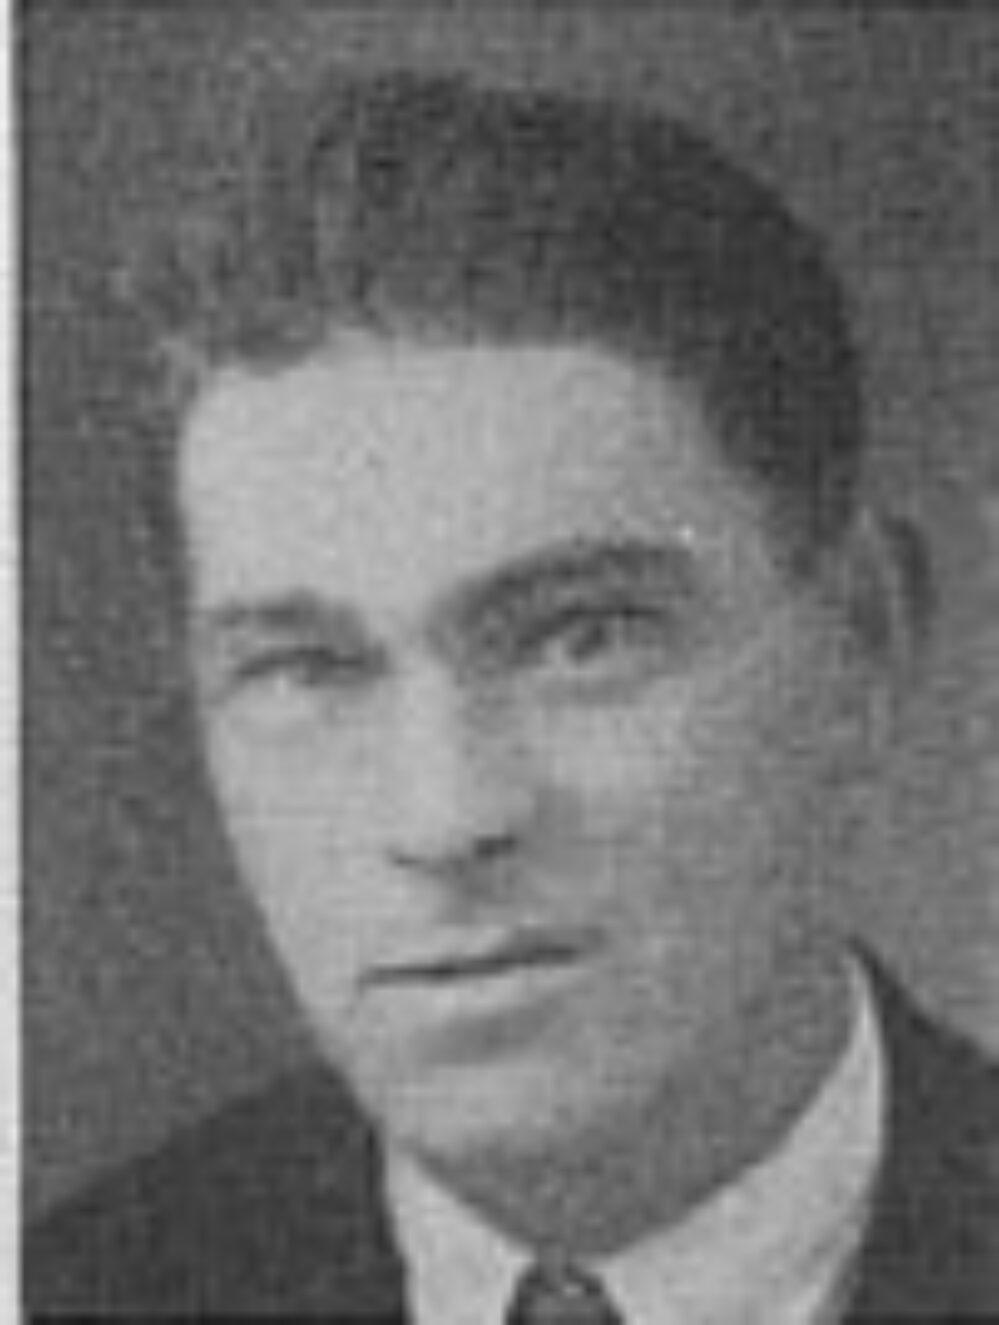 Hans Oluf Frisnes